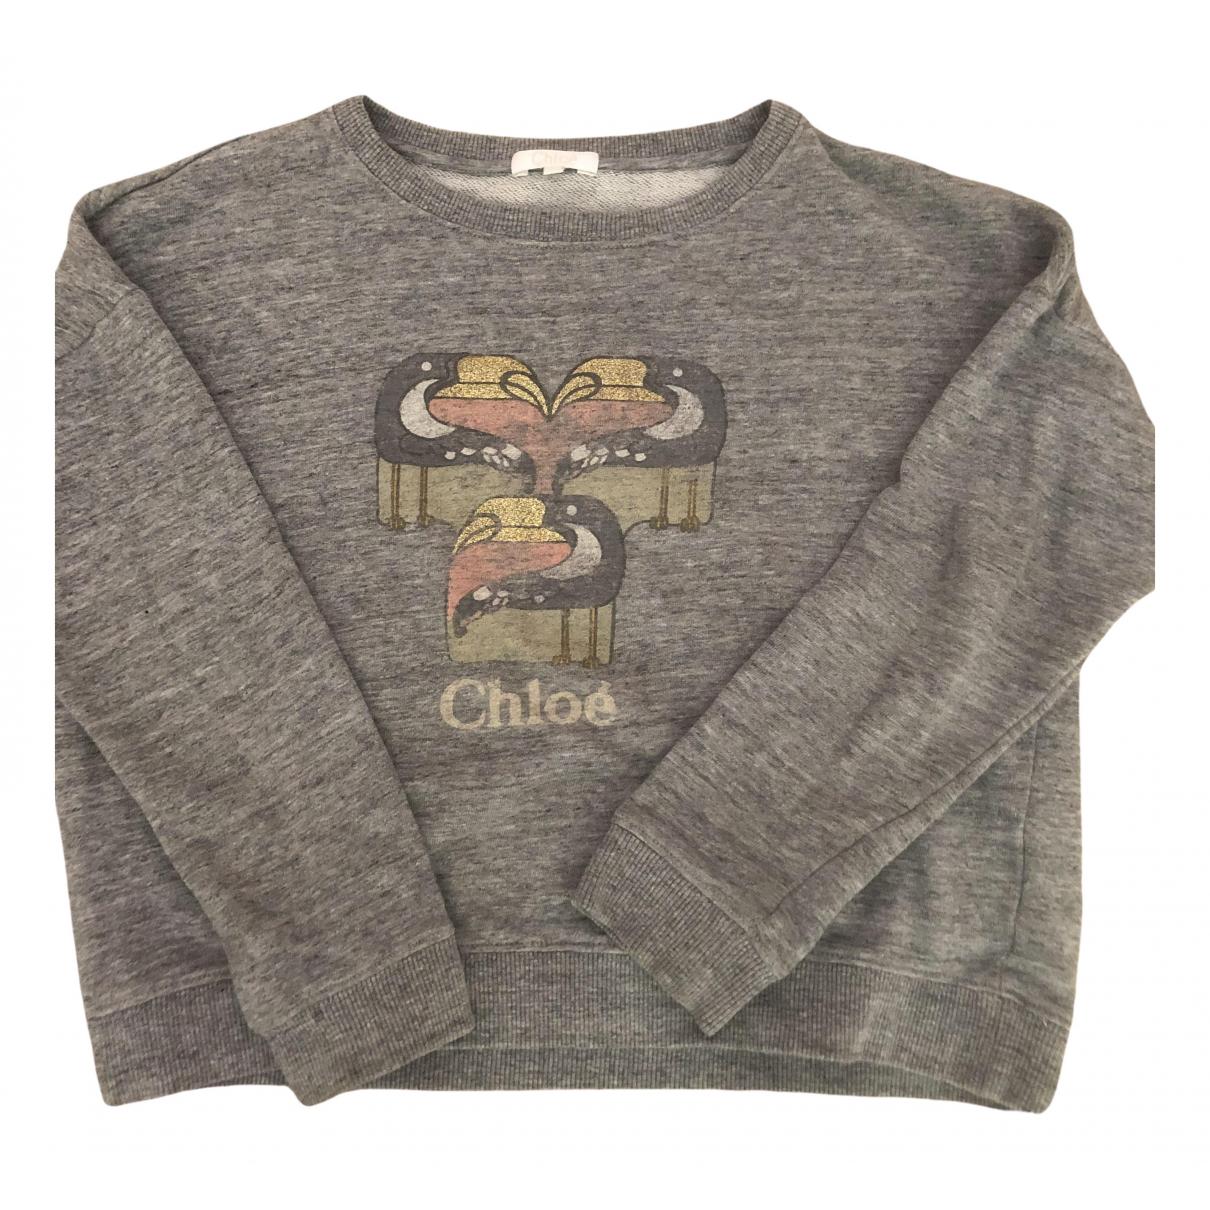 Chloé N Grey Cotton Knitwear for Kids 12 years - XS FR